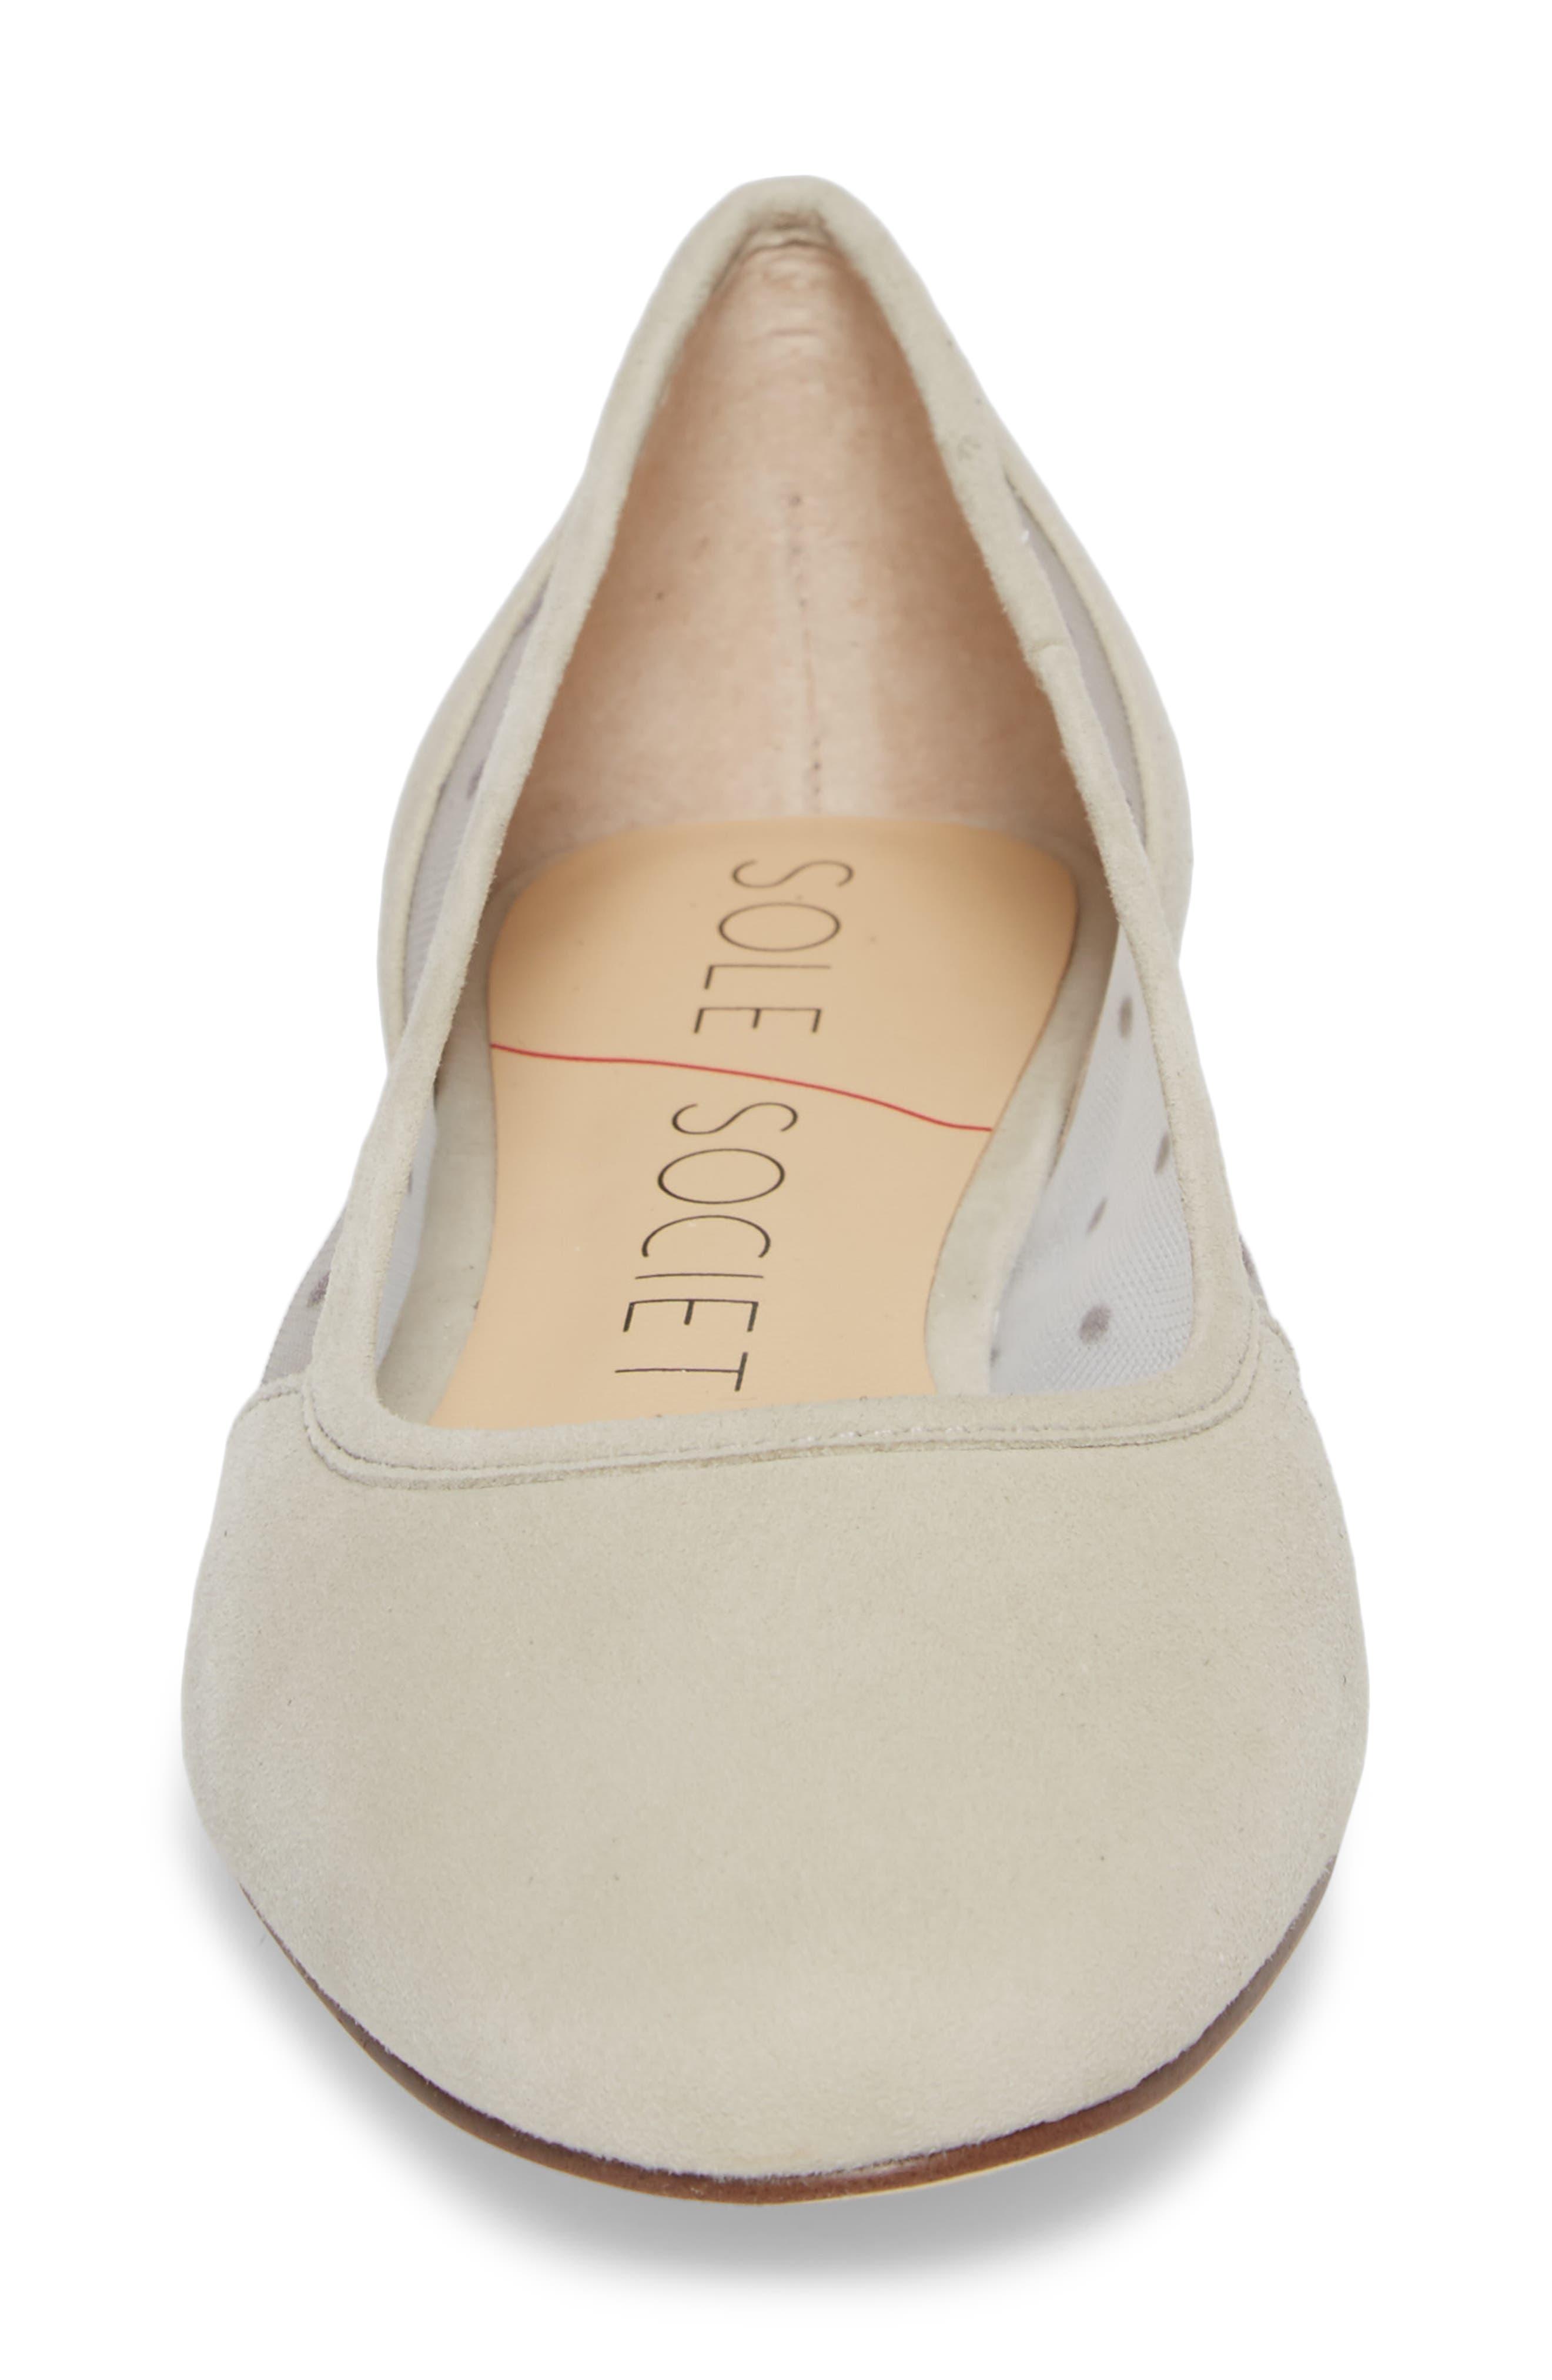 Pammy Ballet Flat,                             Alternate thumbnail 4, color,                             Dove Grey